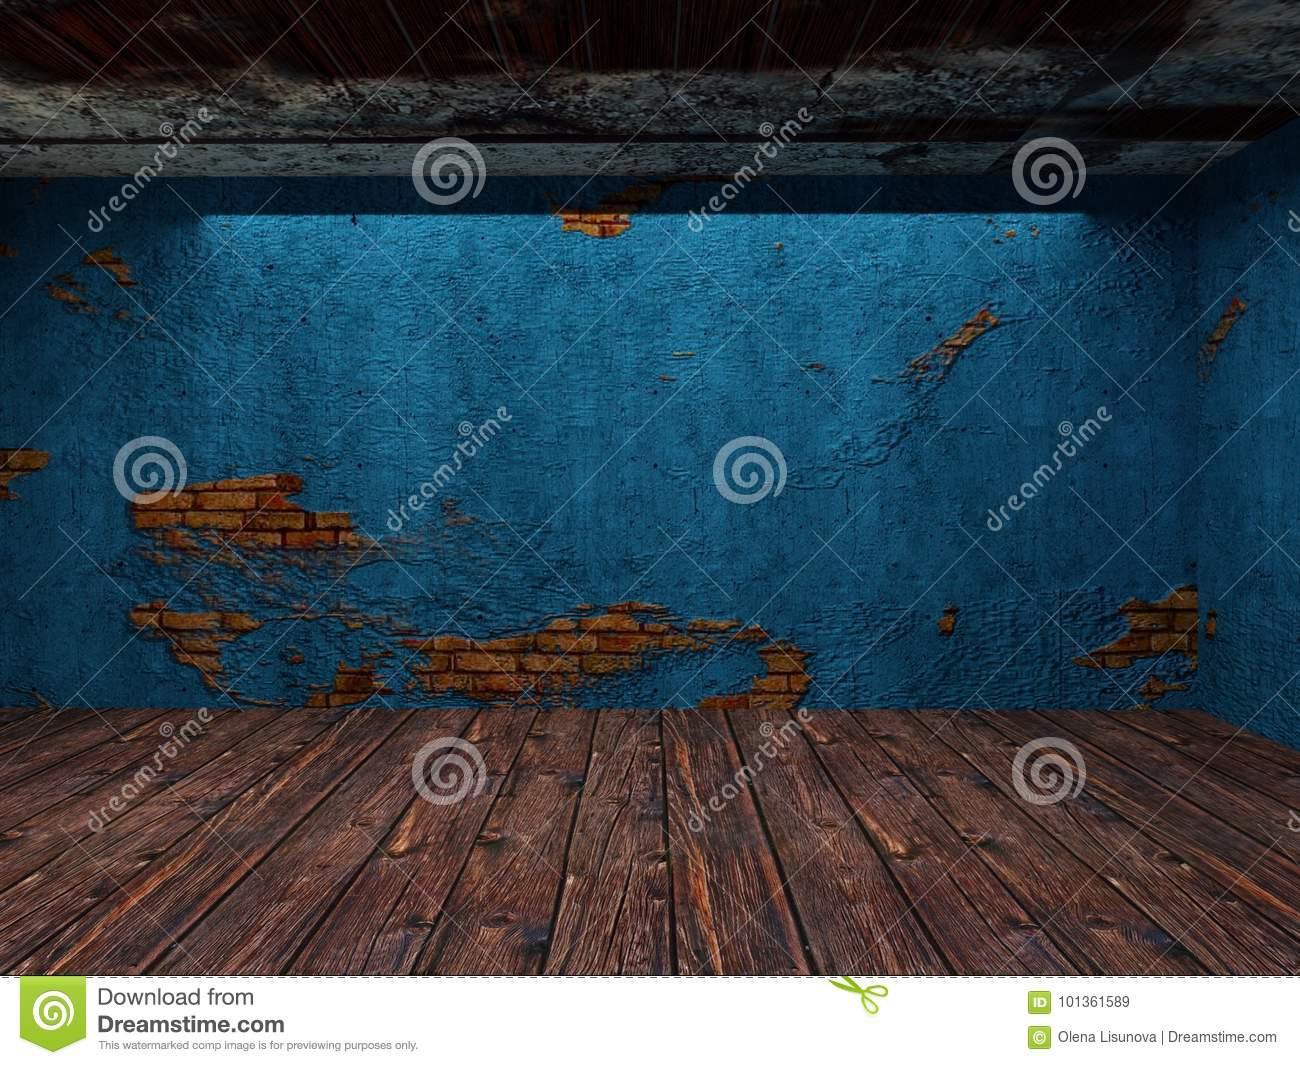 old hardwood floor texture of 3d illustration of background od old abandoned room stock pertaining to download 3d illustration of background od old abandoned room stock illustration illustration of plaster